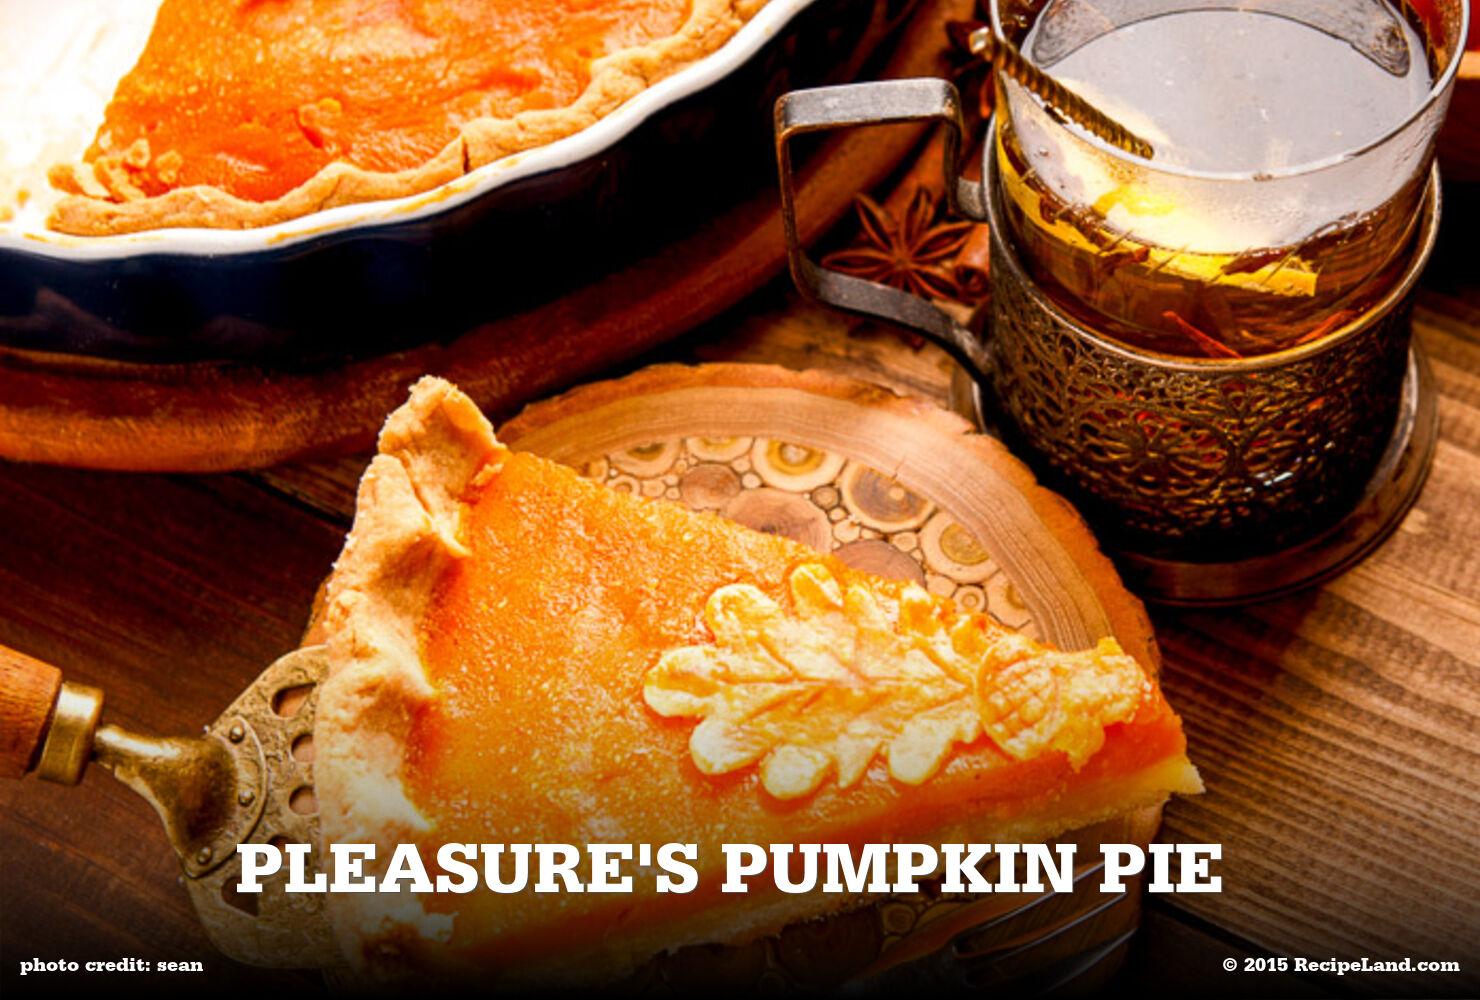 Pleasure's Pumpkin Pie